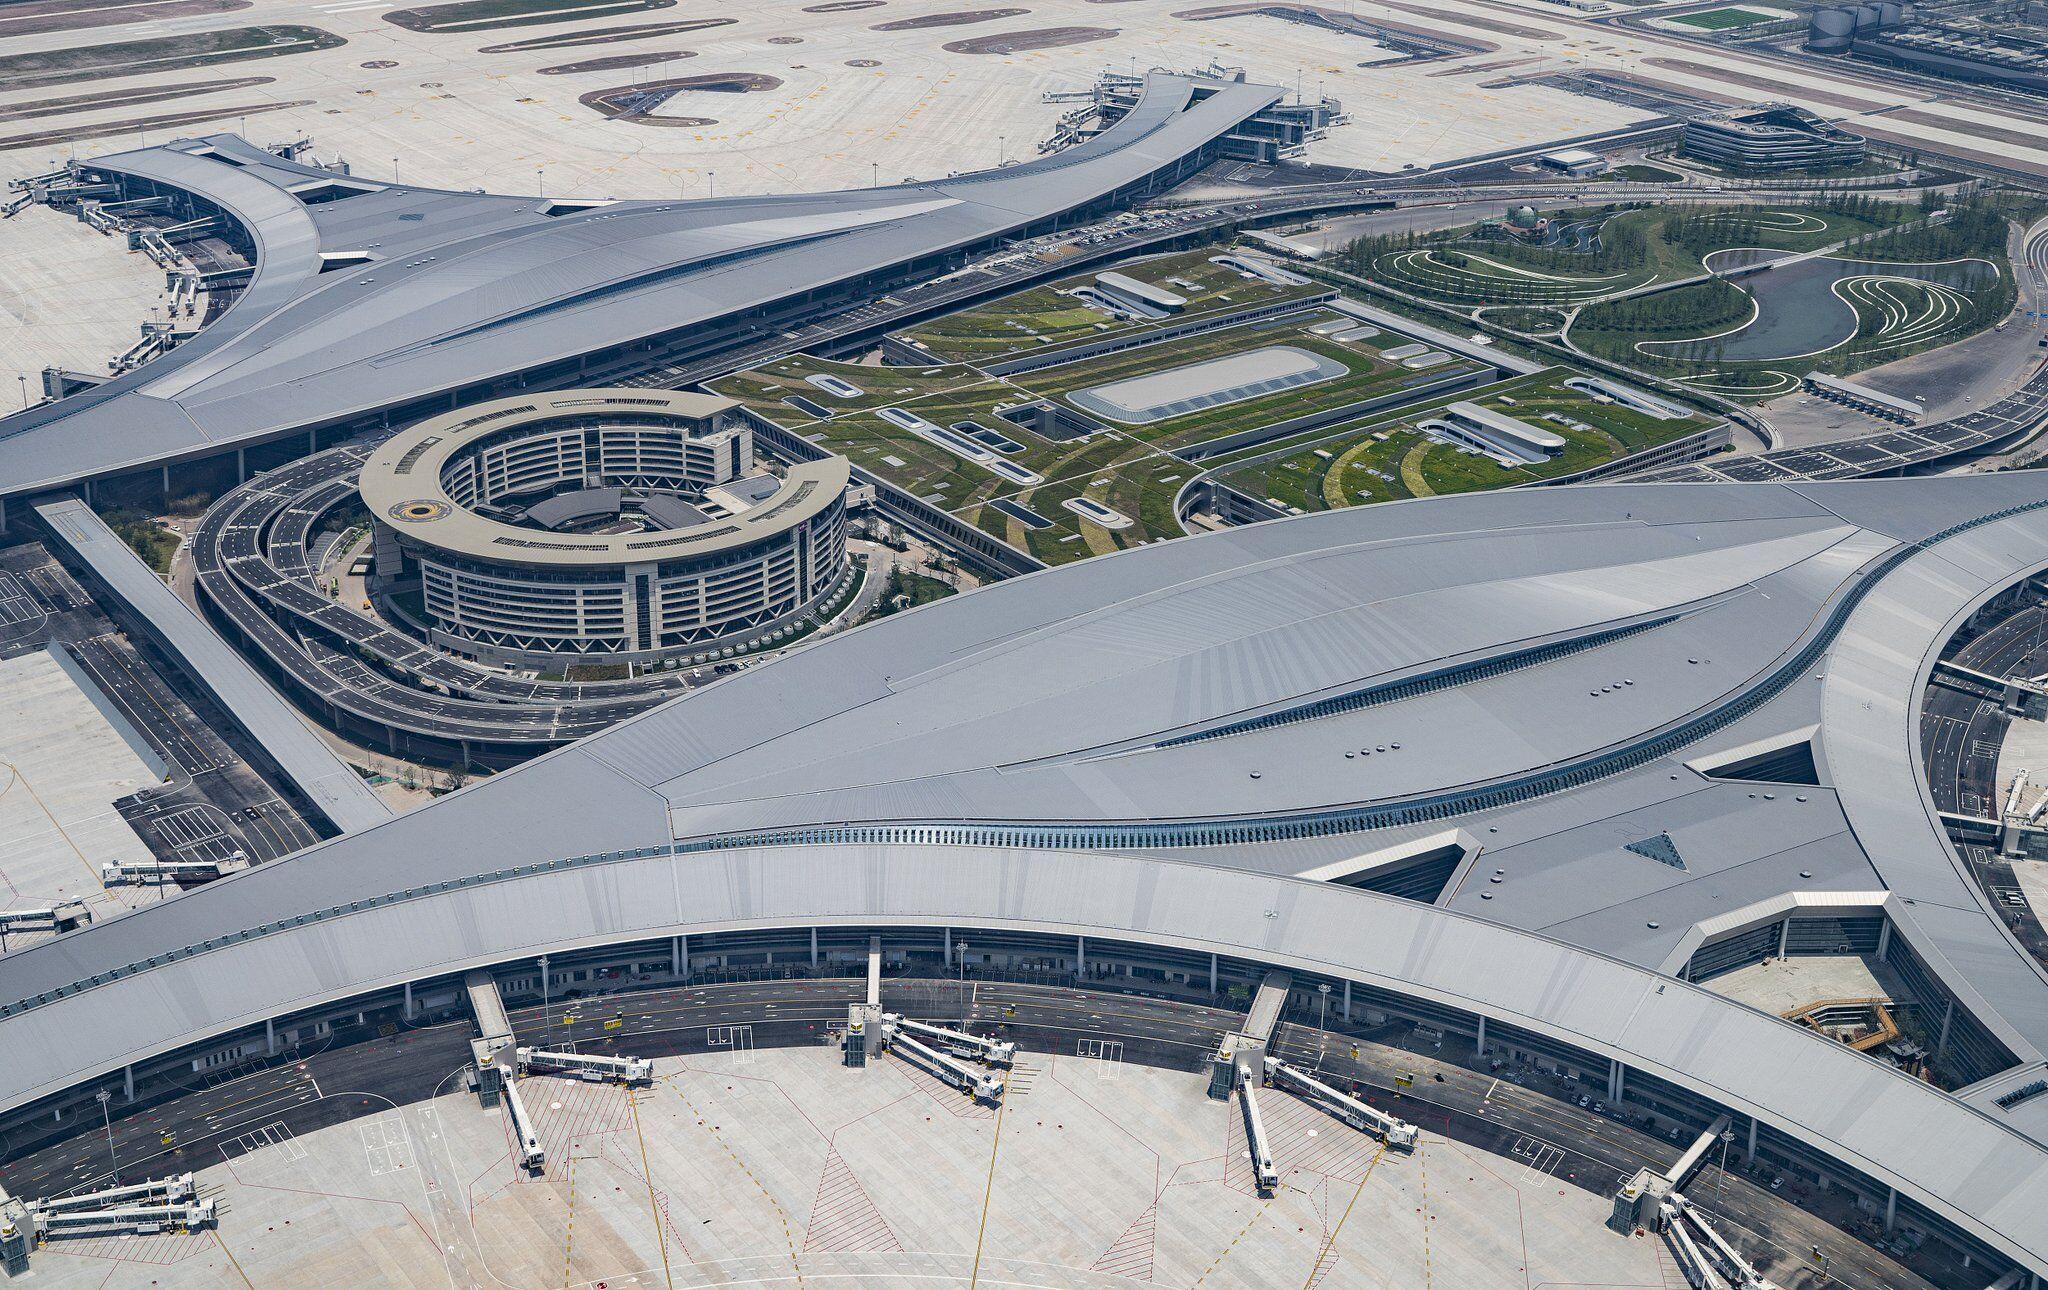 se-inauguro-el-nuevo-aeropuerto-internacional-chengdu-tianfu-alt